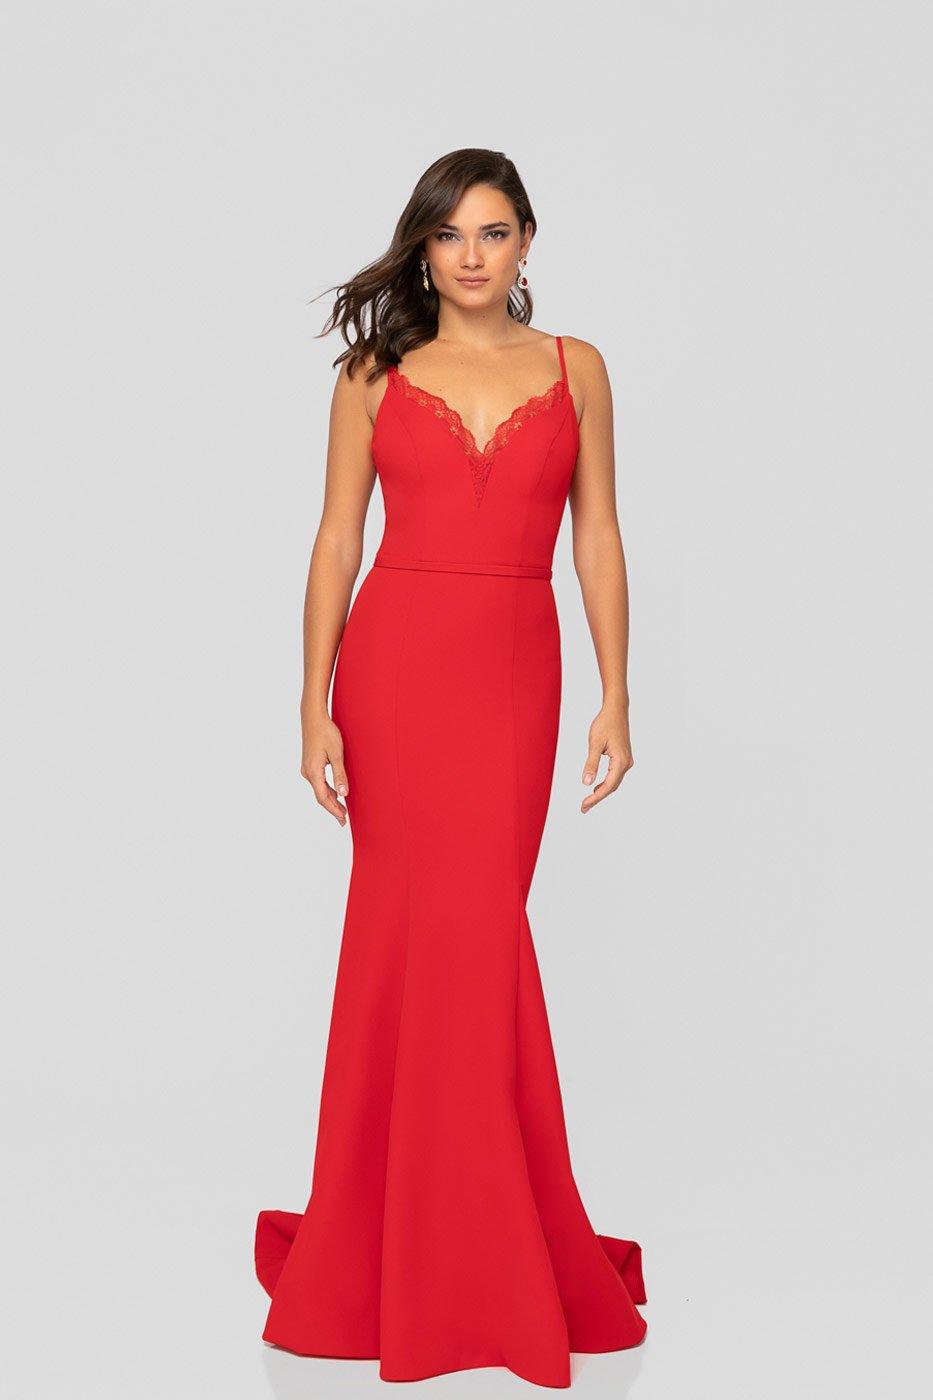 The diva red dress thumbnail